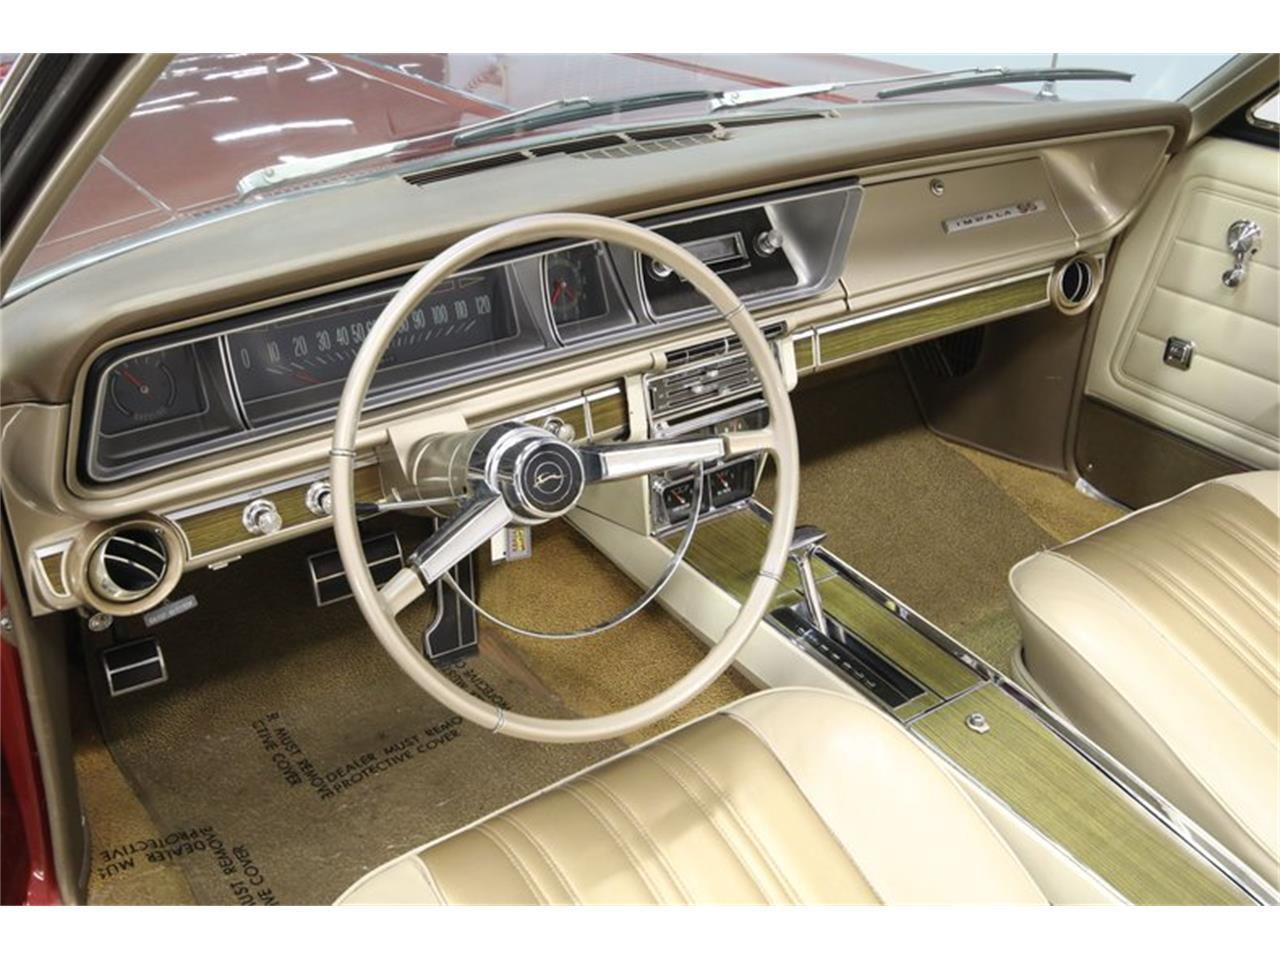 1966 Chevrolet Impala (CC-1336776) for sale in Lutz, Florida